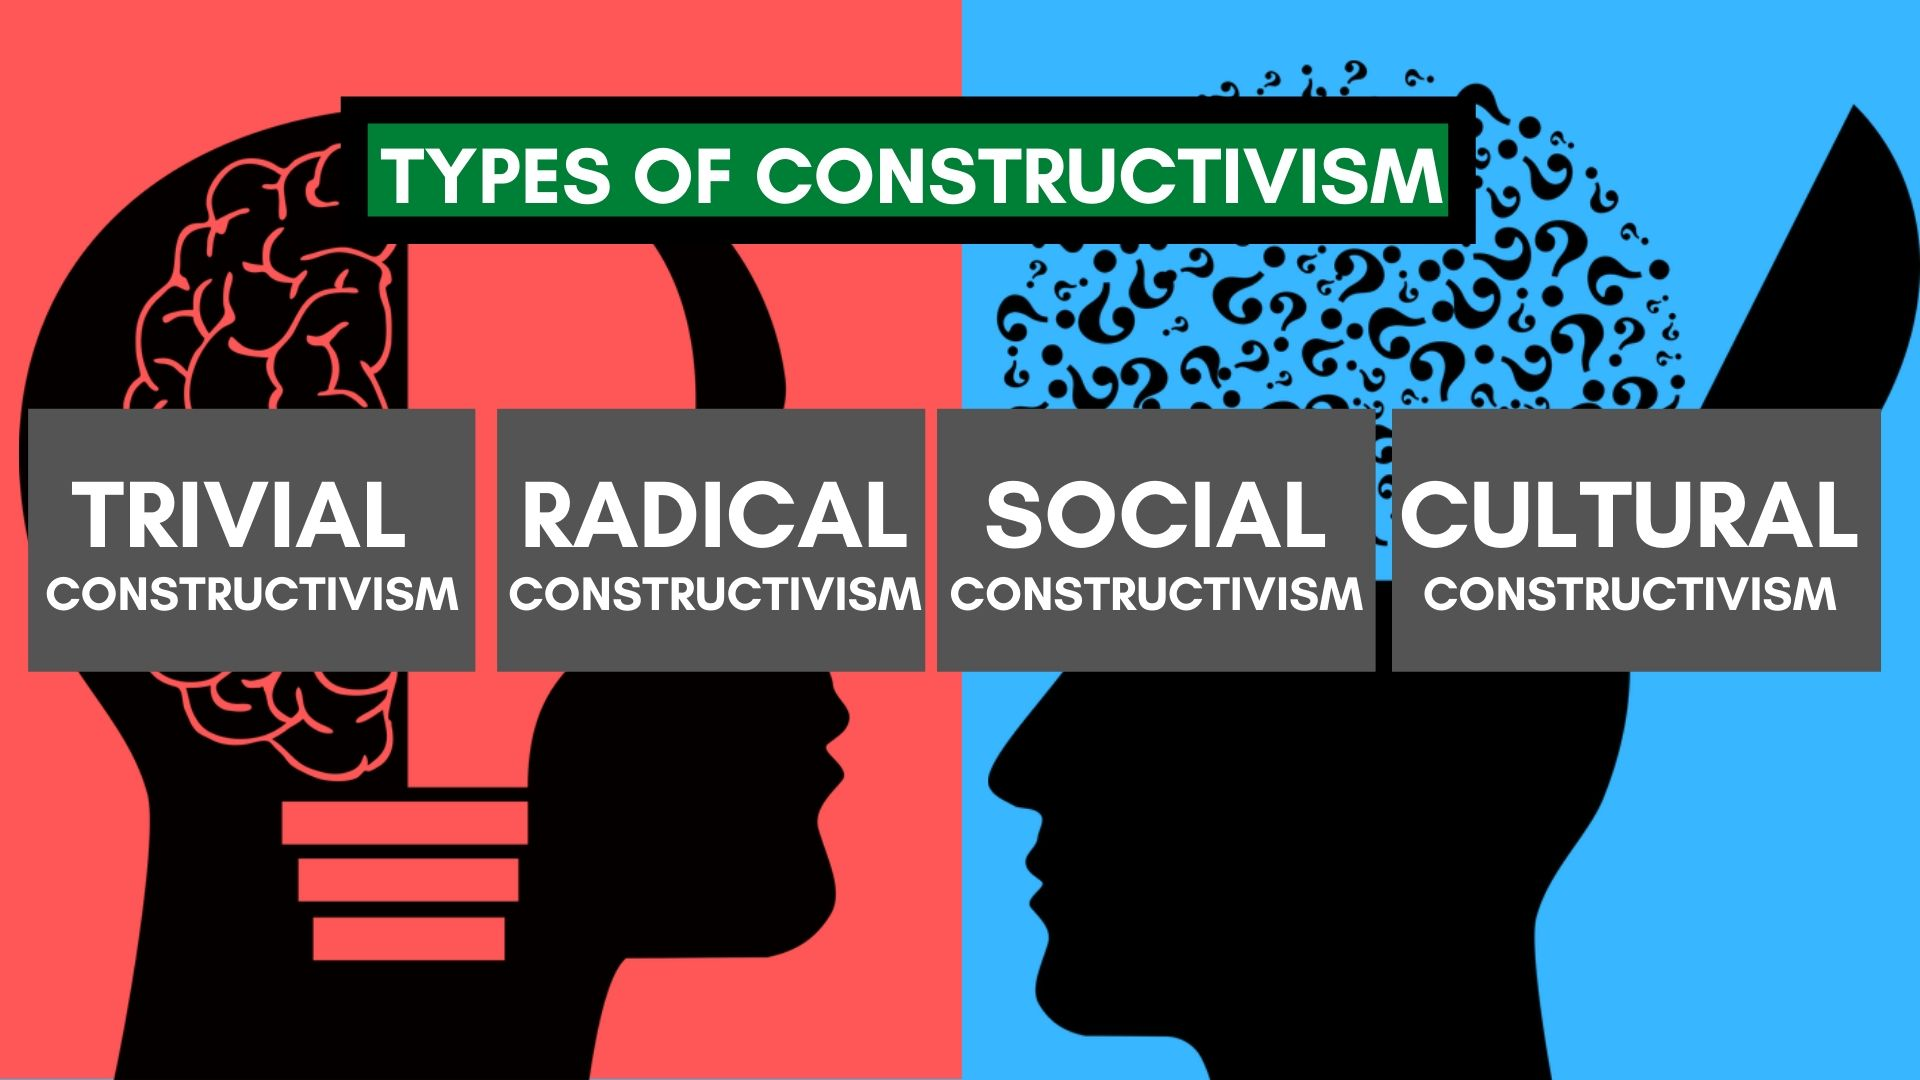 types of constructivism